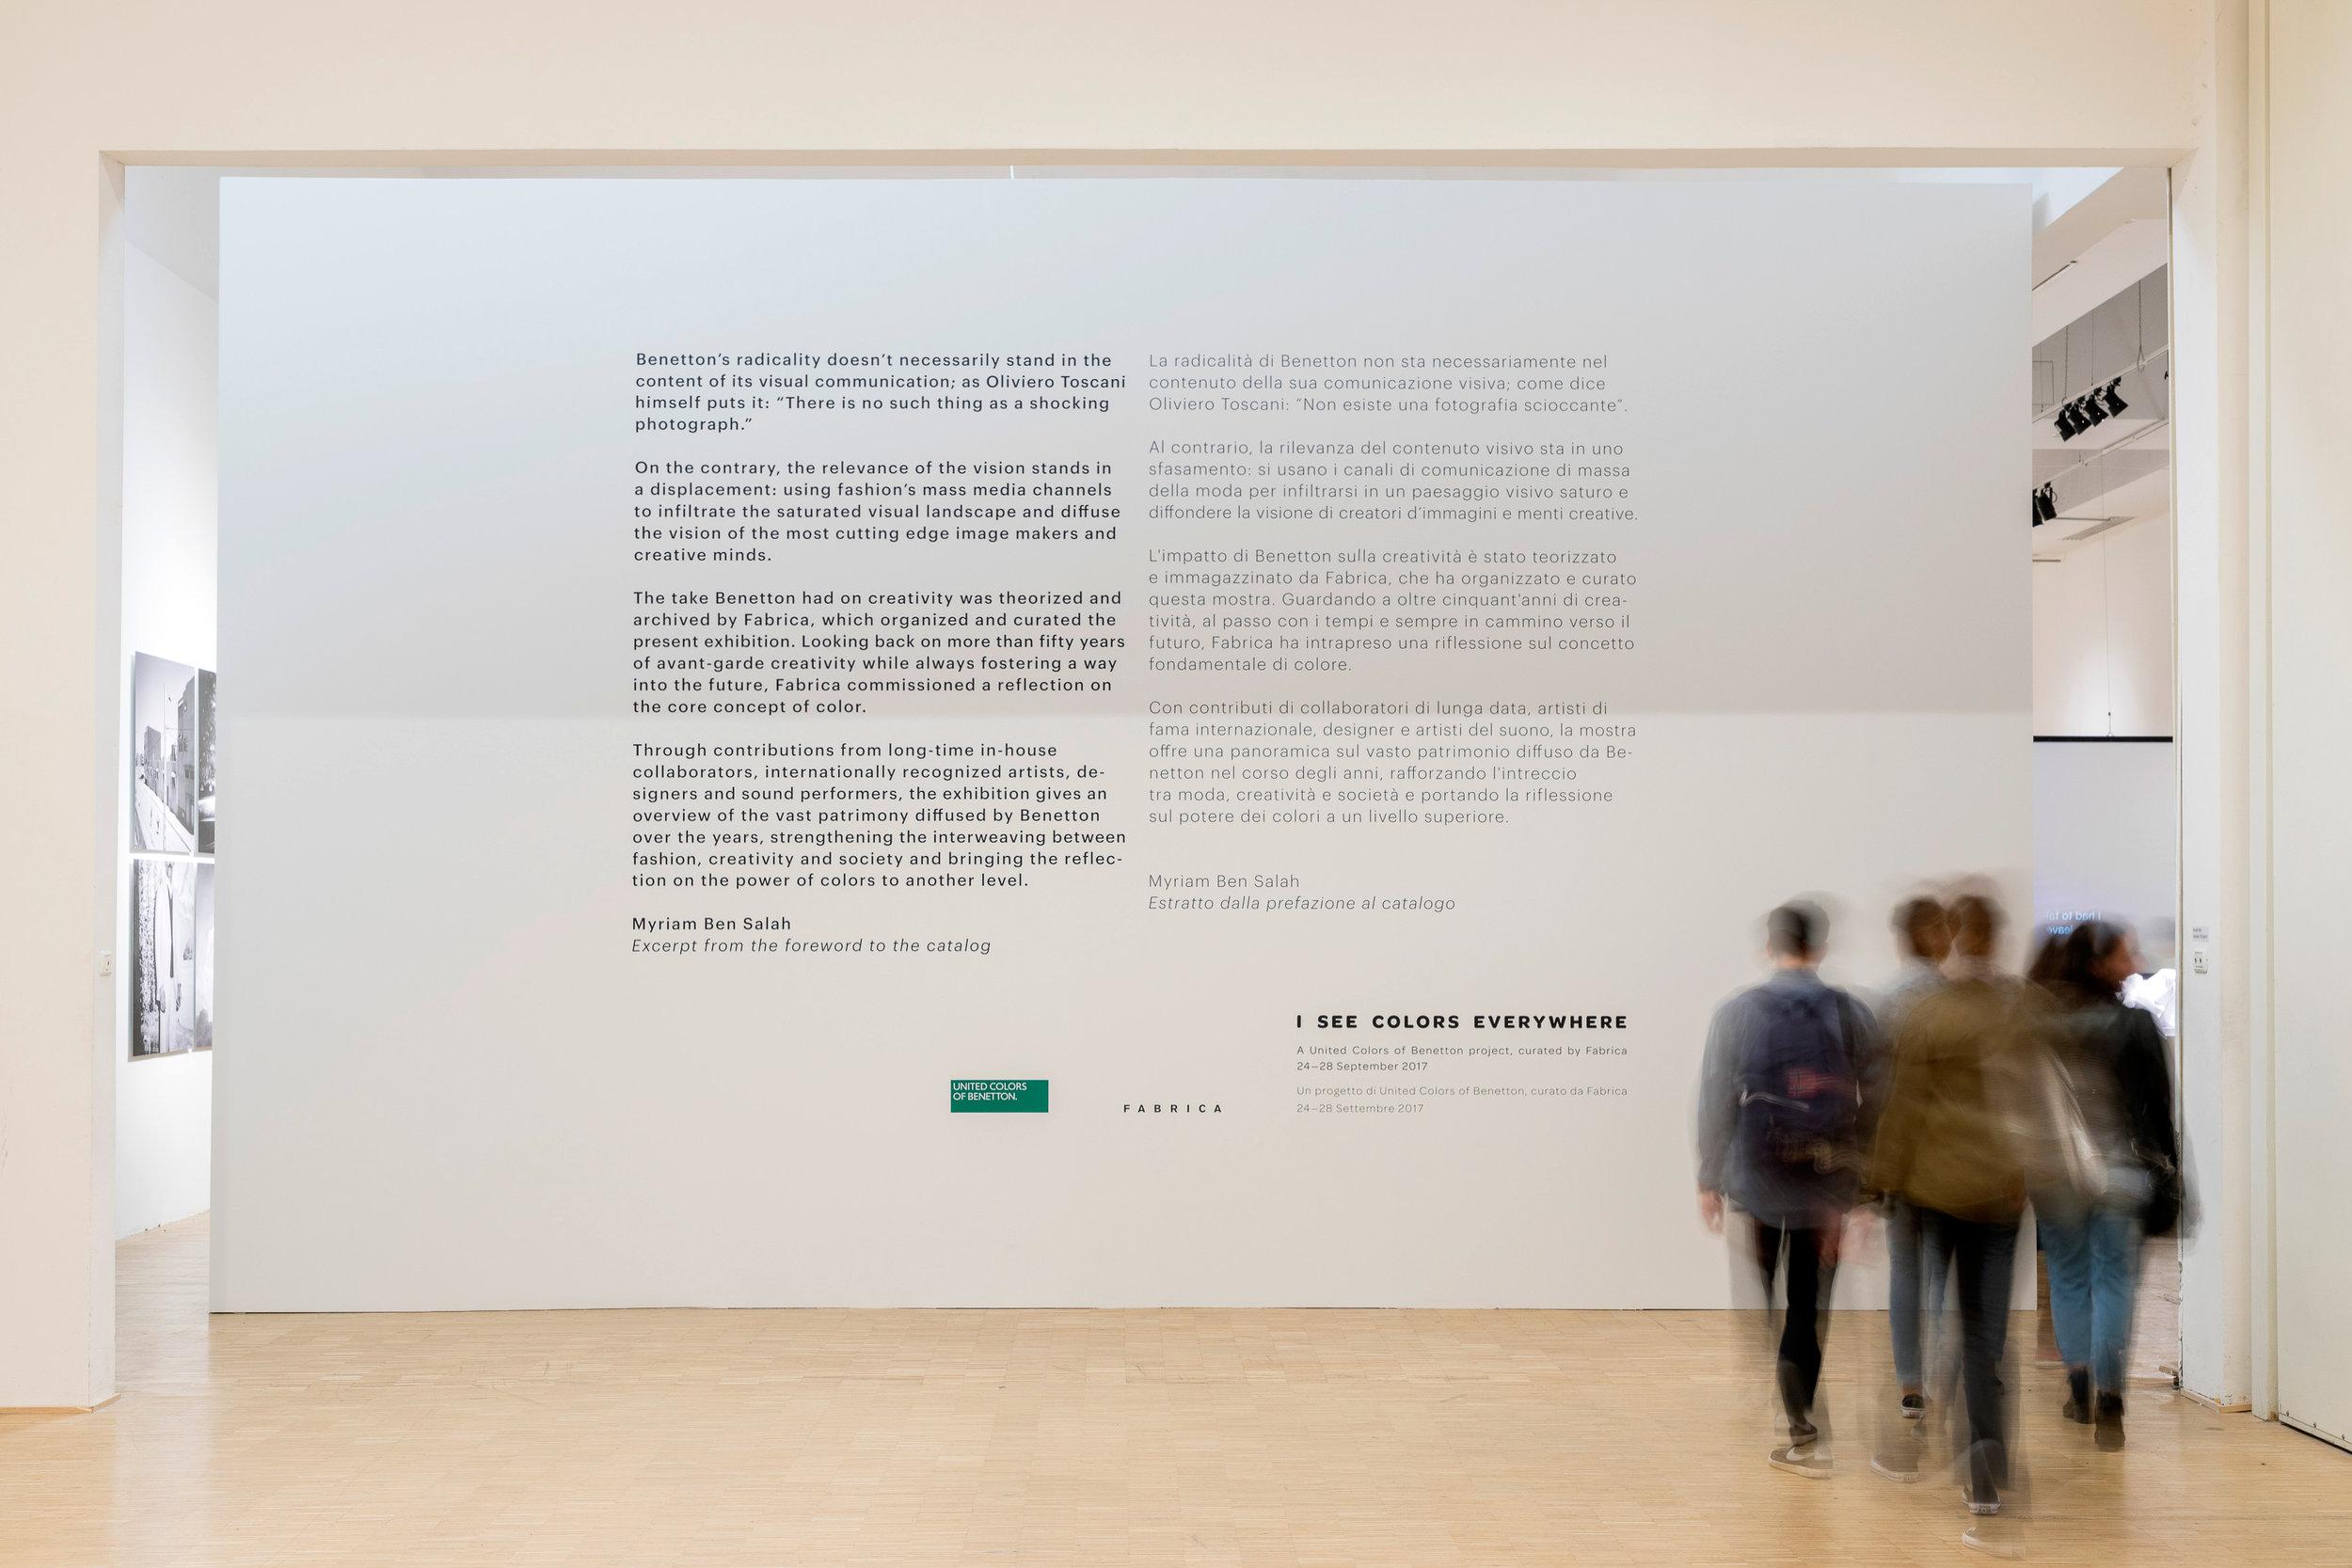 I_SEE_COLORS_EVERYWHERE_exhibition_Triennale_Milan_Fabrica_ph_Marco_Zanin_2017_0103.jpg